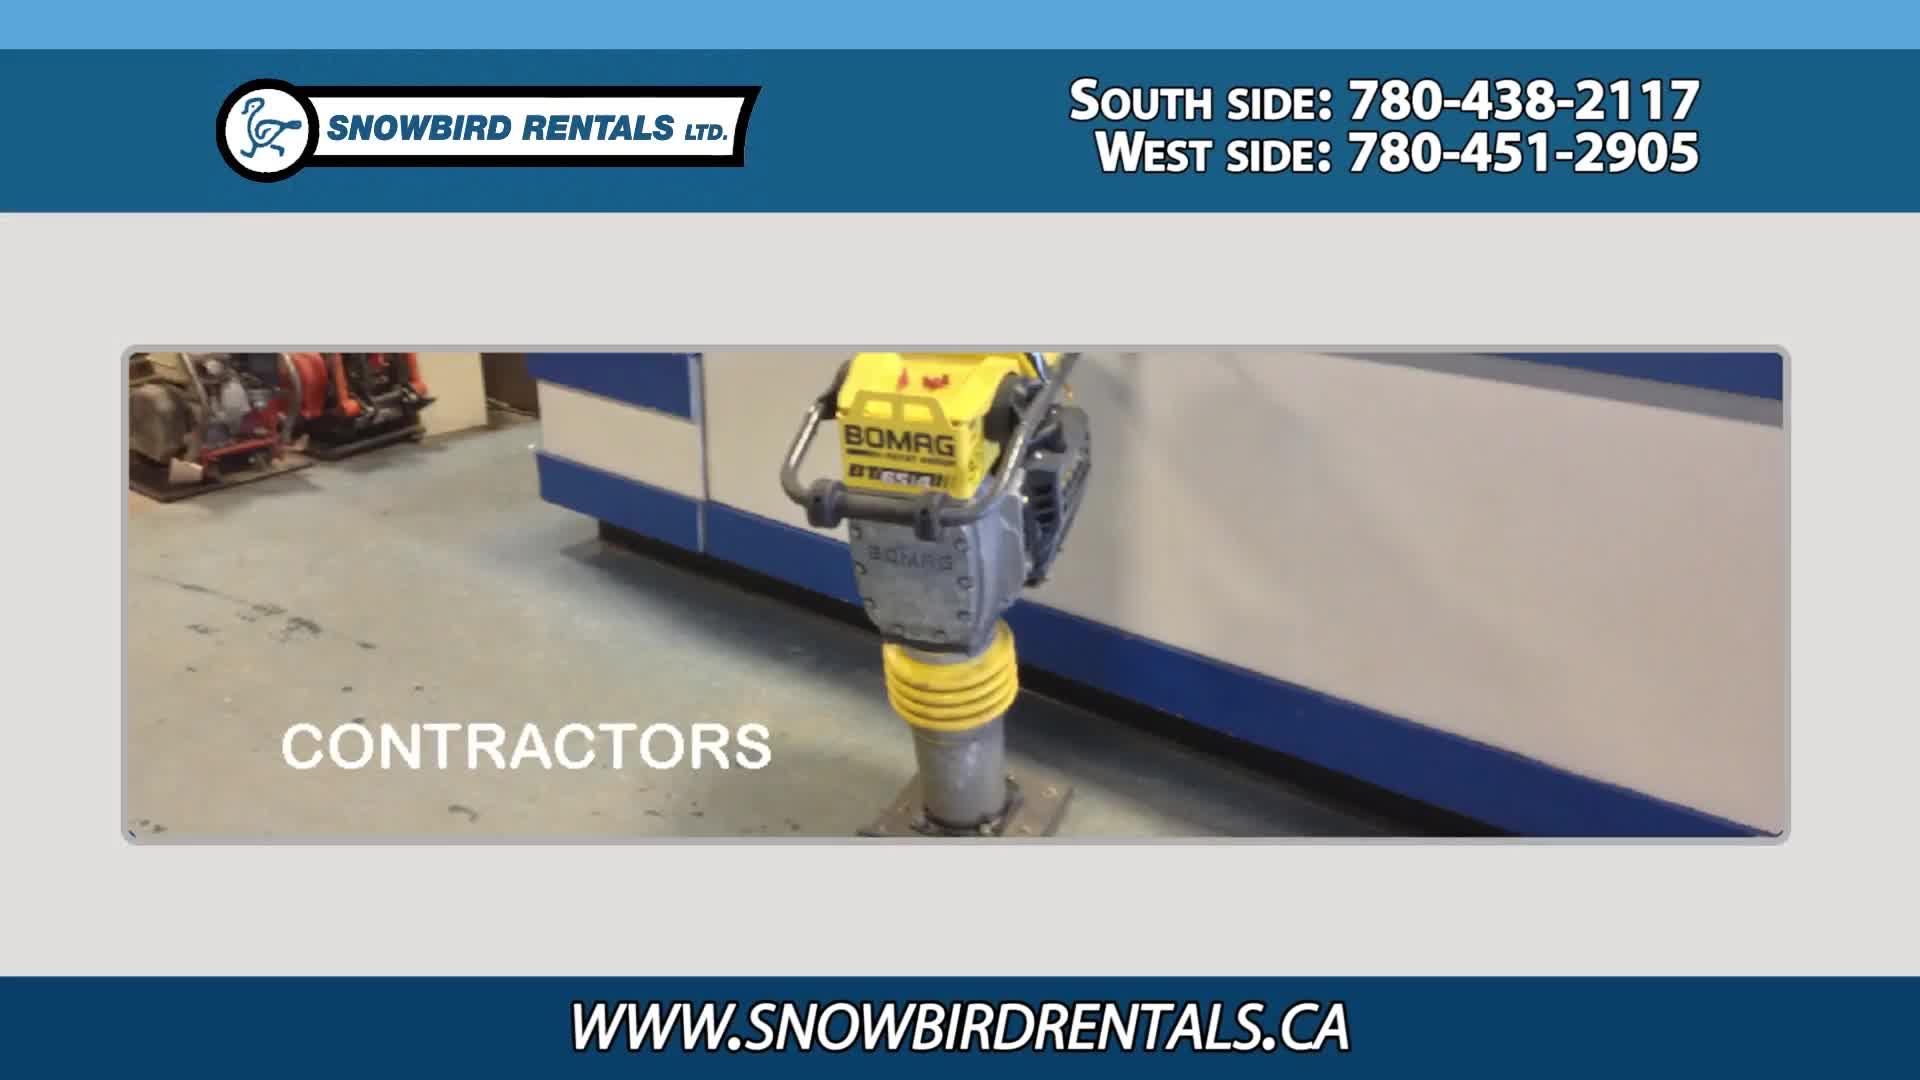 Snowbird Rentals Ltd - General Rental Service - 780-438-2117